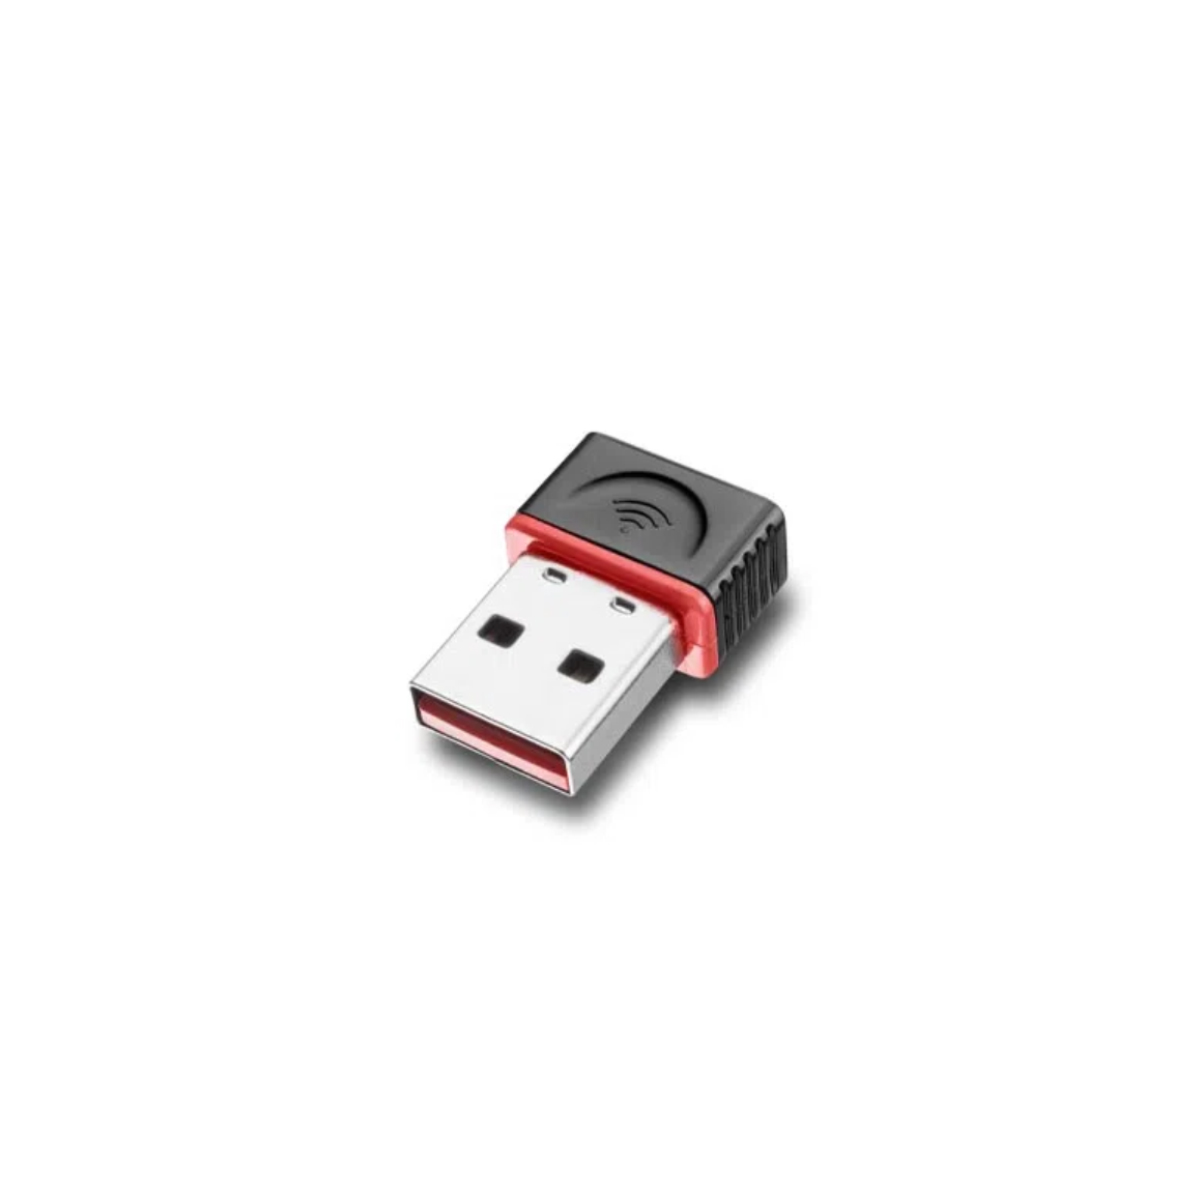 Adaptador Usb Wireless Nano 150mbps Multilaser Re035